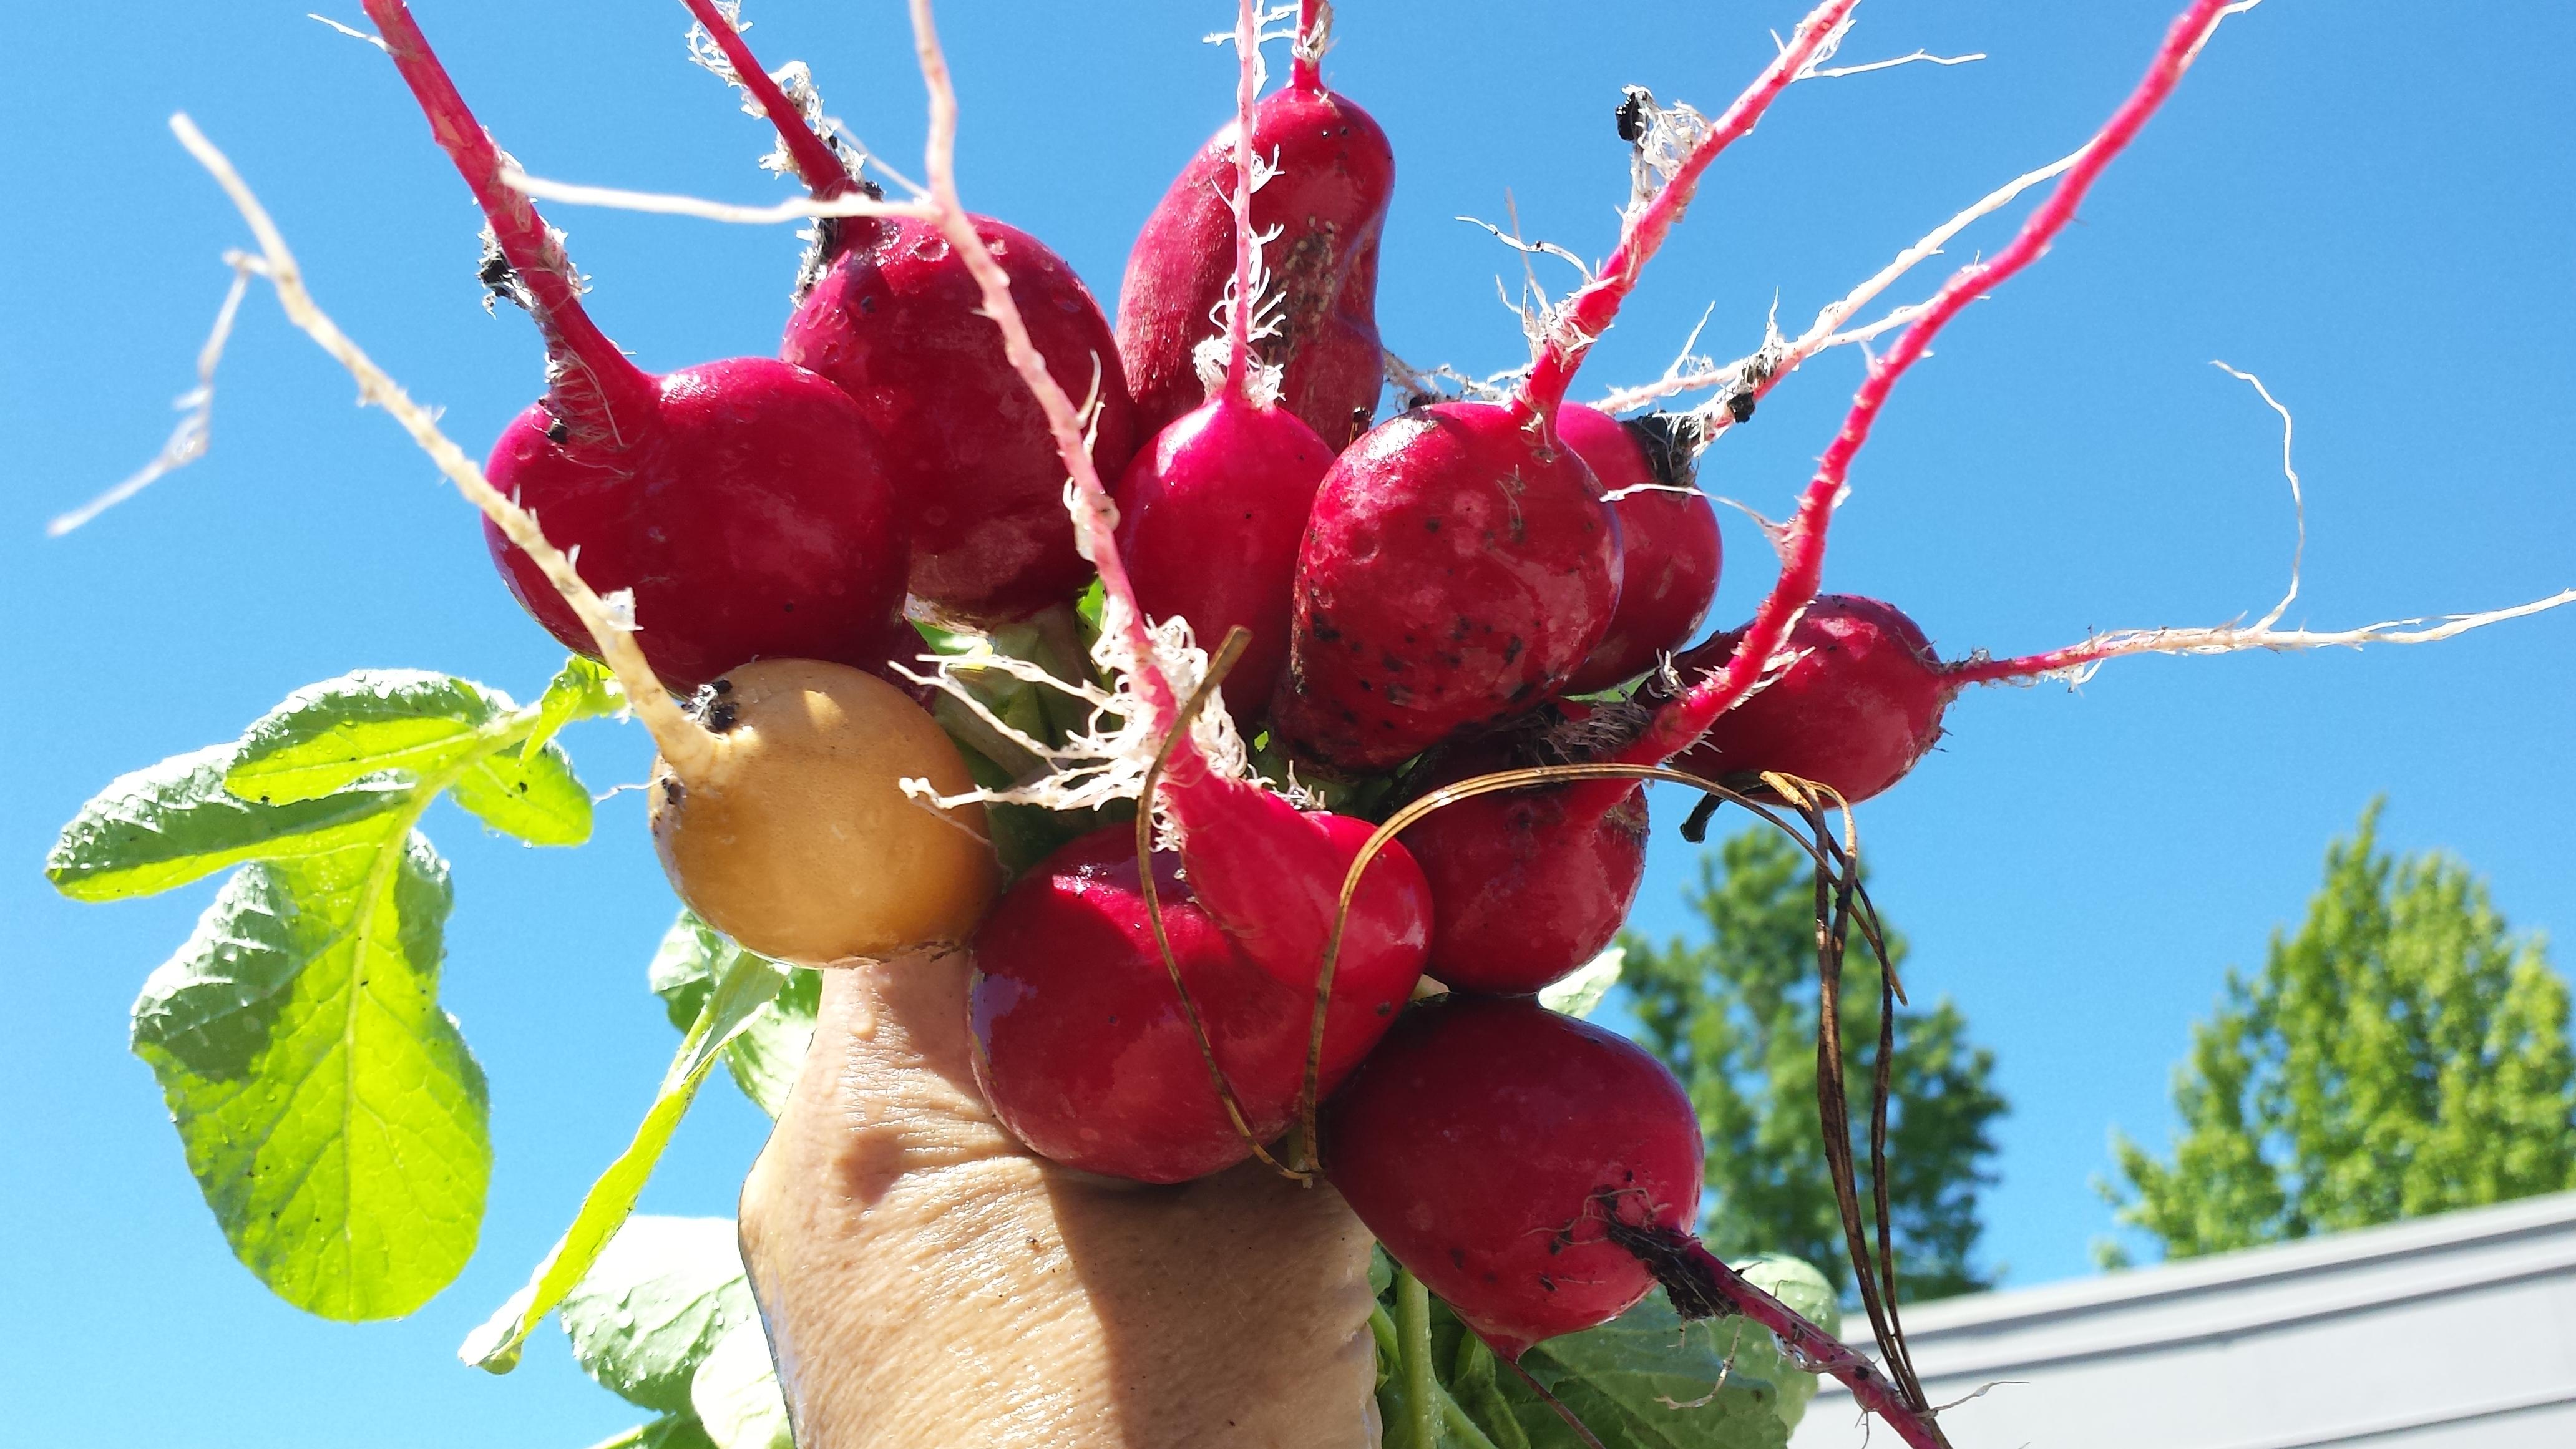 http://schoolgardenproject.org/wp-content/uploads/2011/09/radish-harvest.jpg